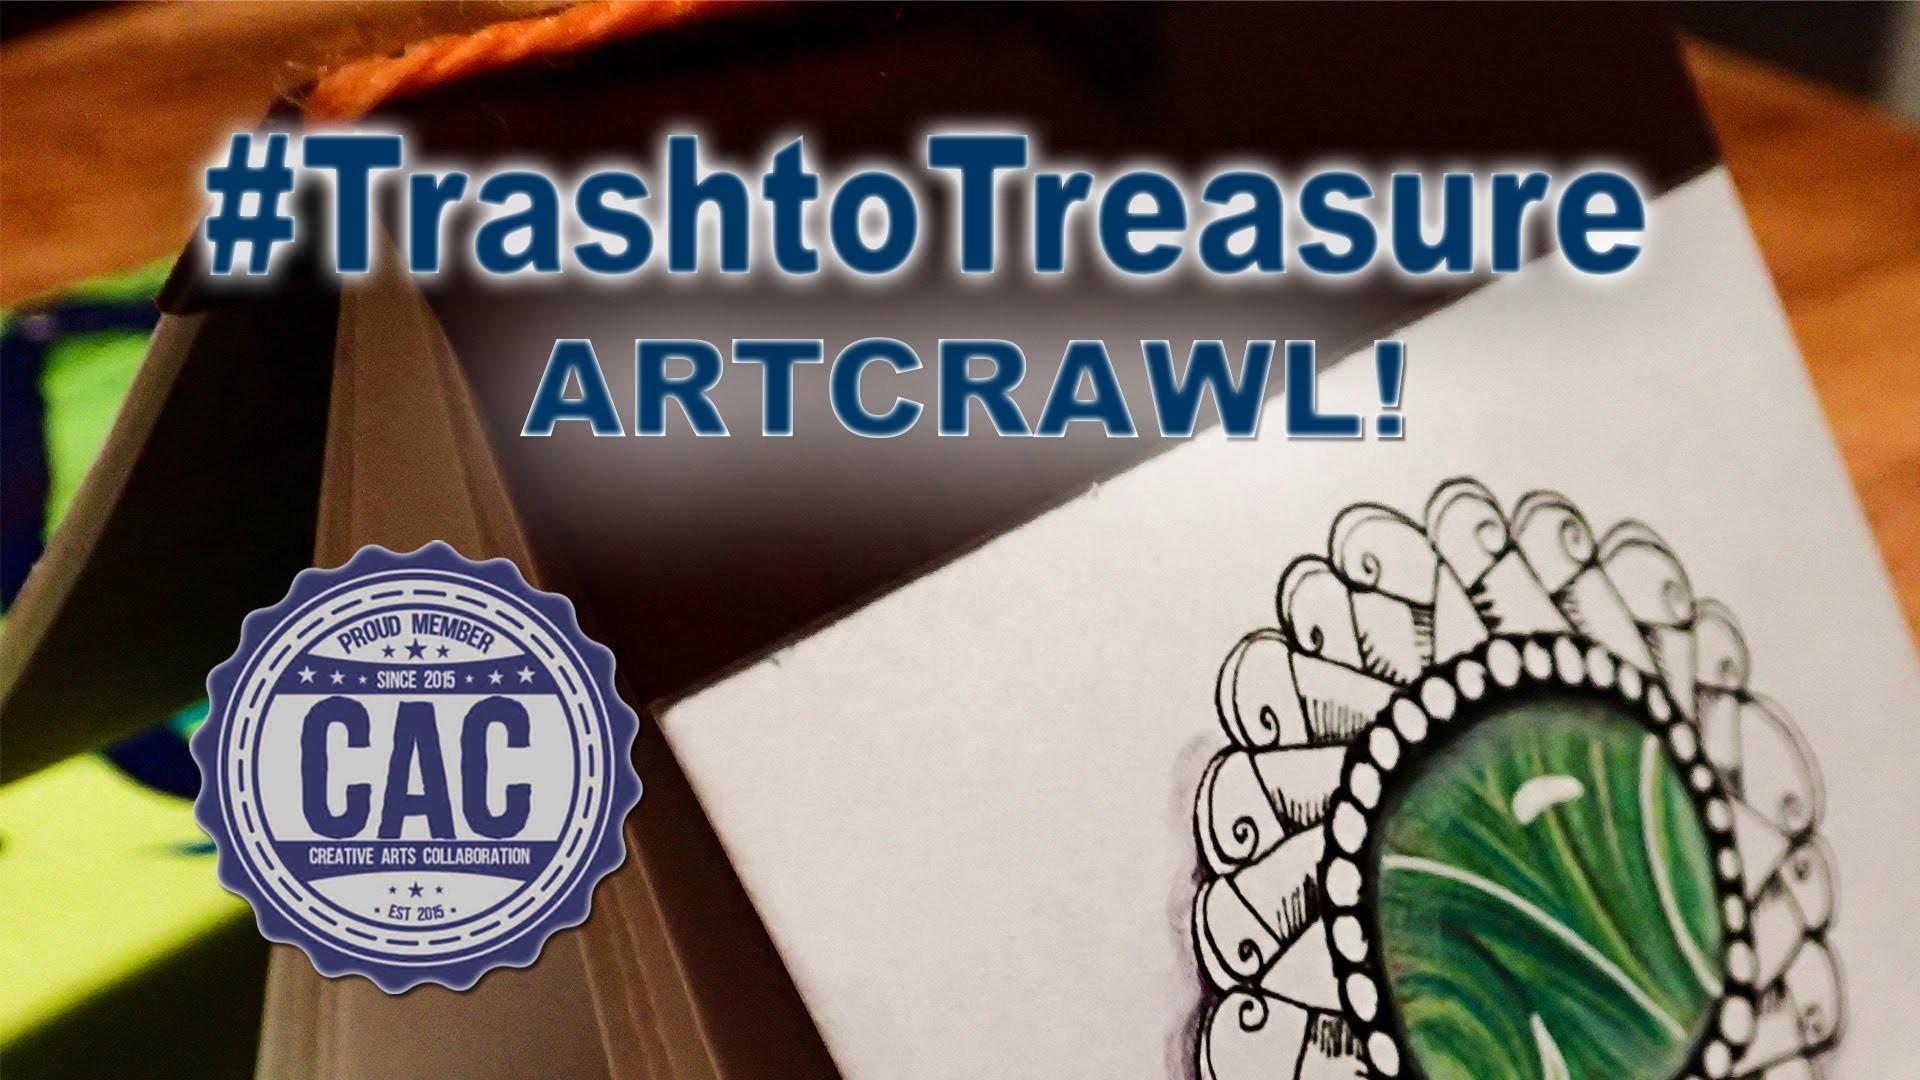 How to Draw a Doodle Gem Tutorial  Trash to Treasure Art Crawl